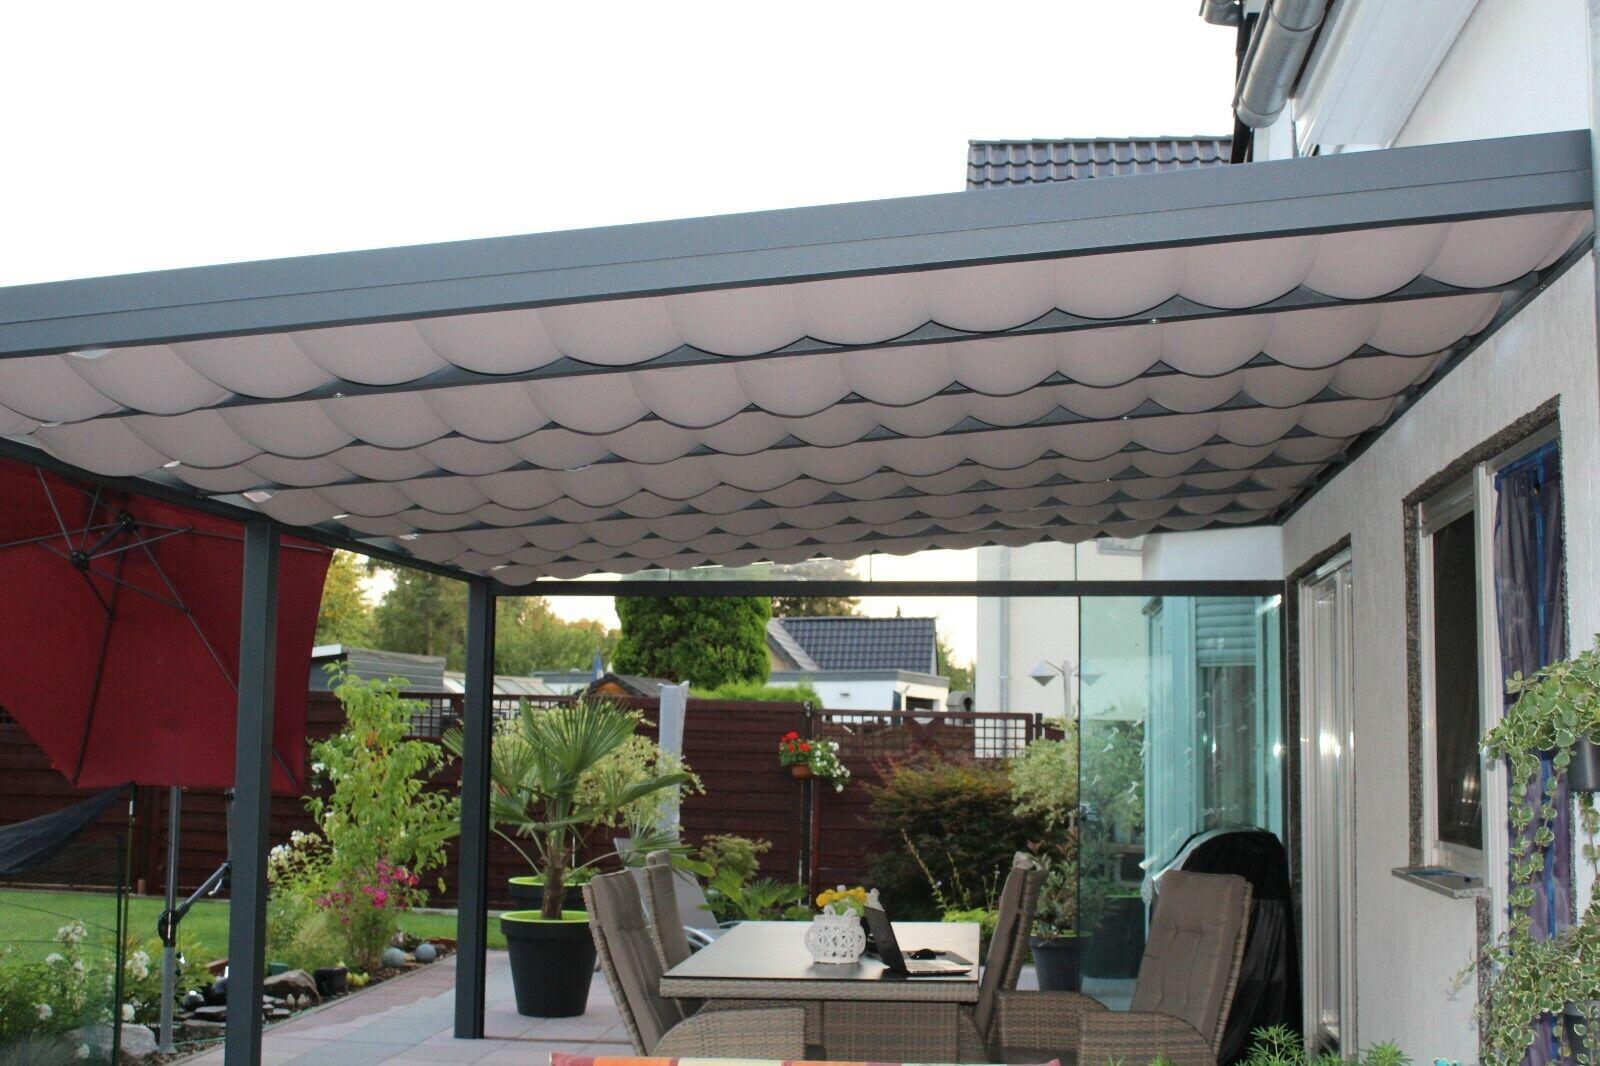 Unterglas Unterdach Beschattung Terrassenbeschattung Thermoschutz Maß Markise